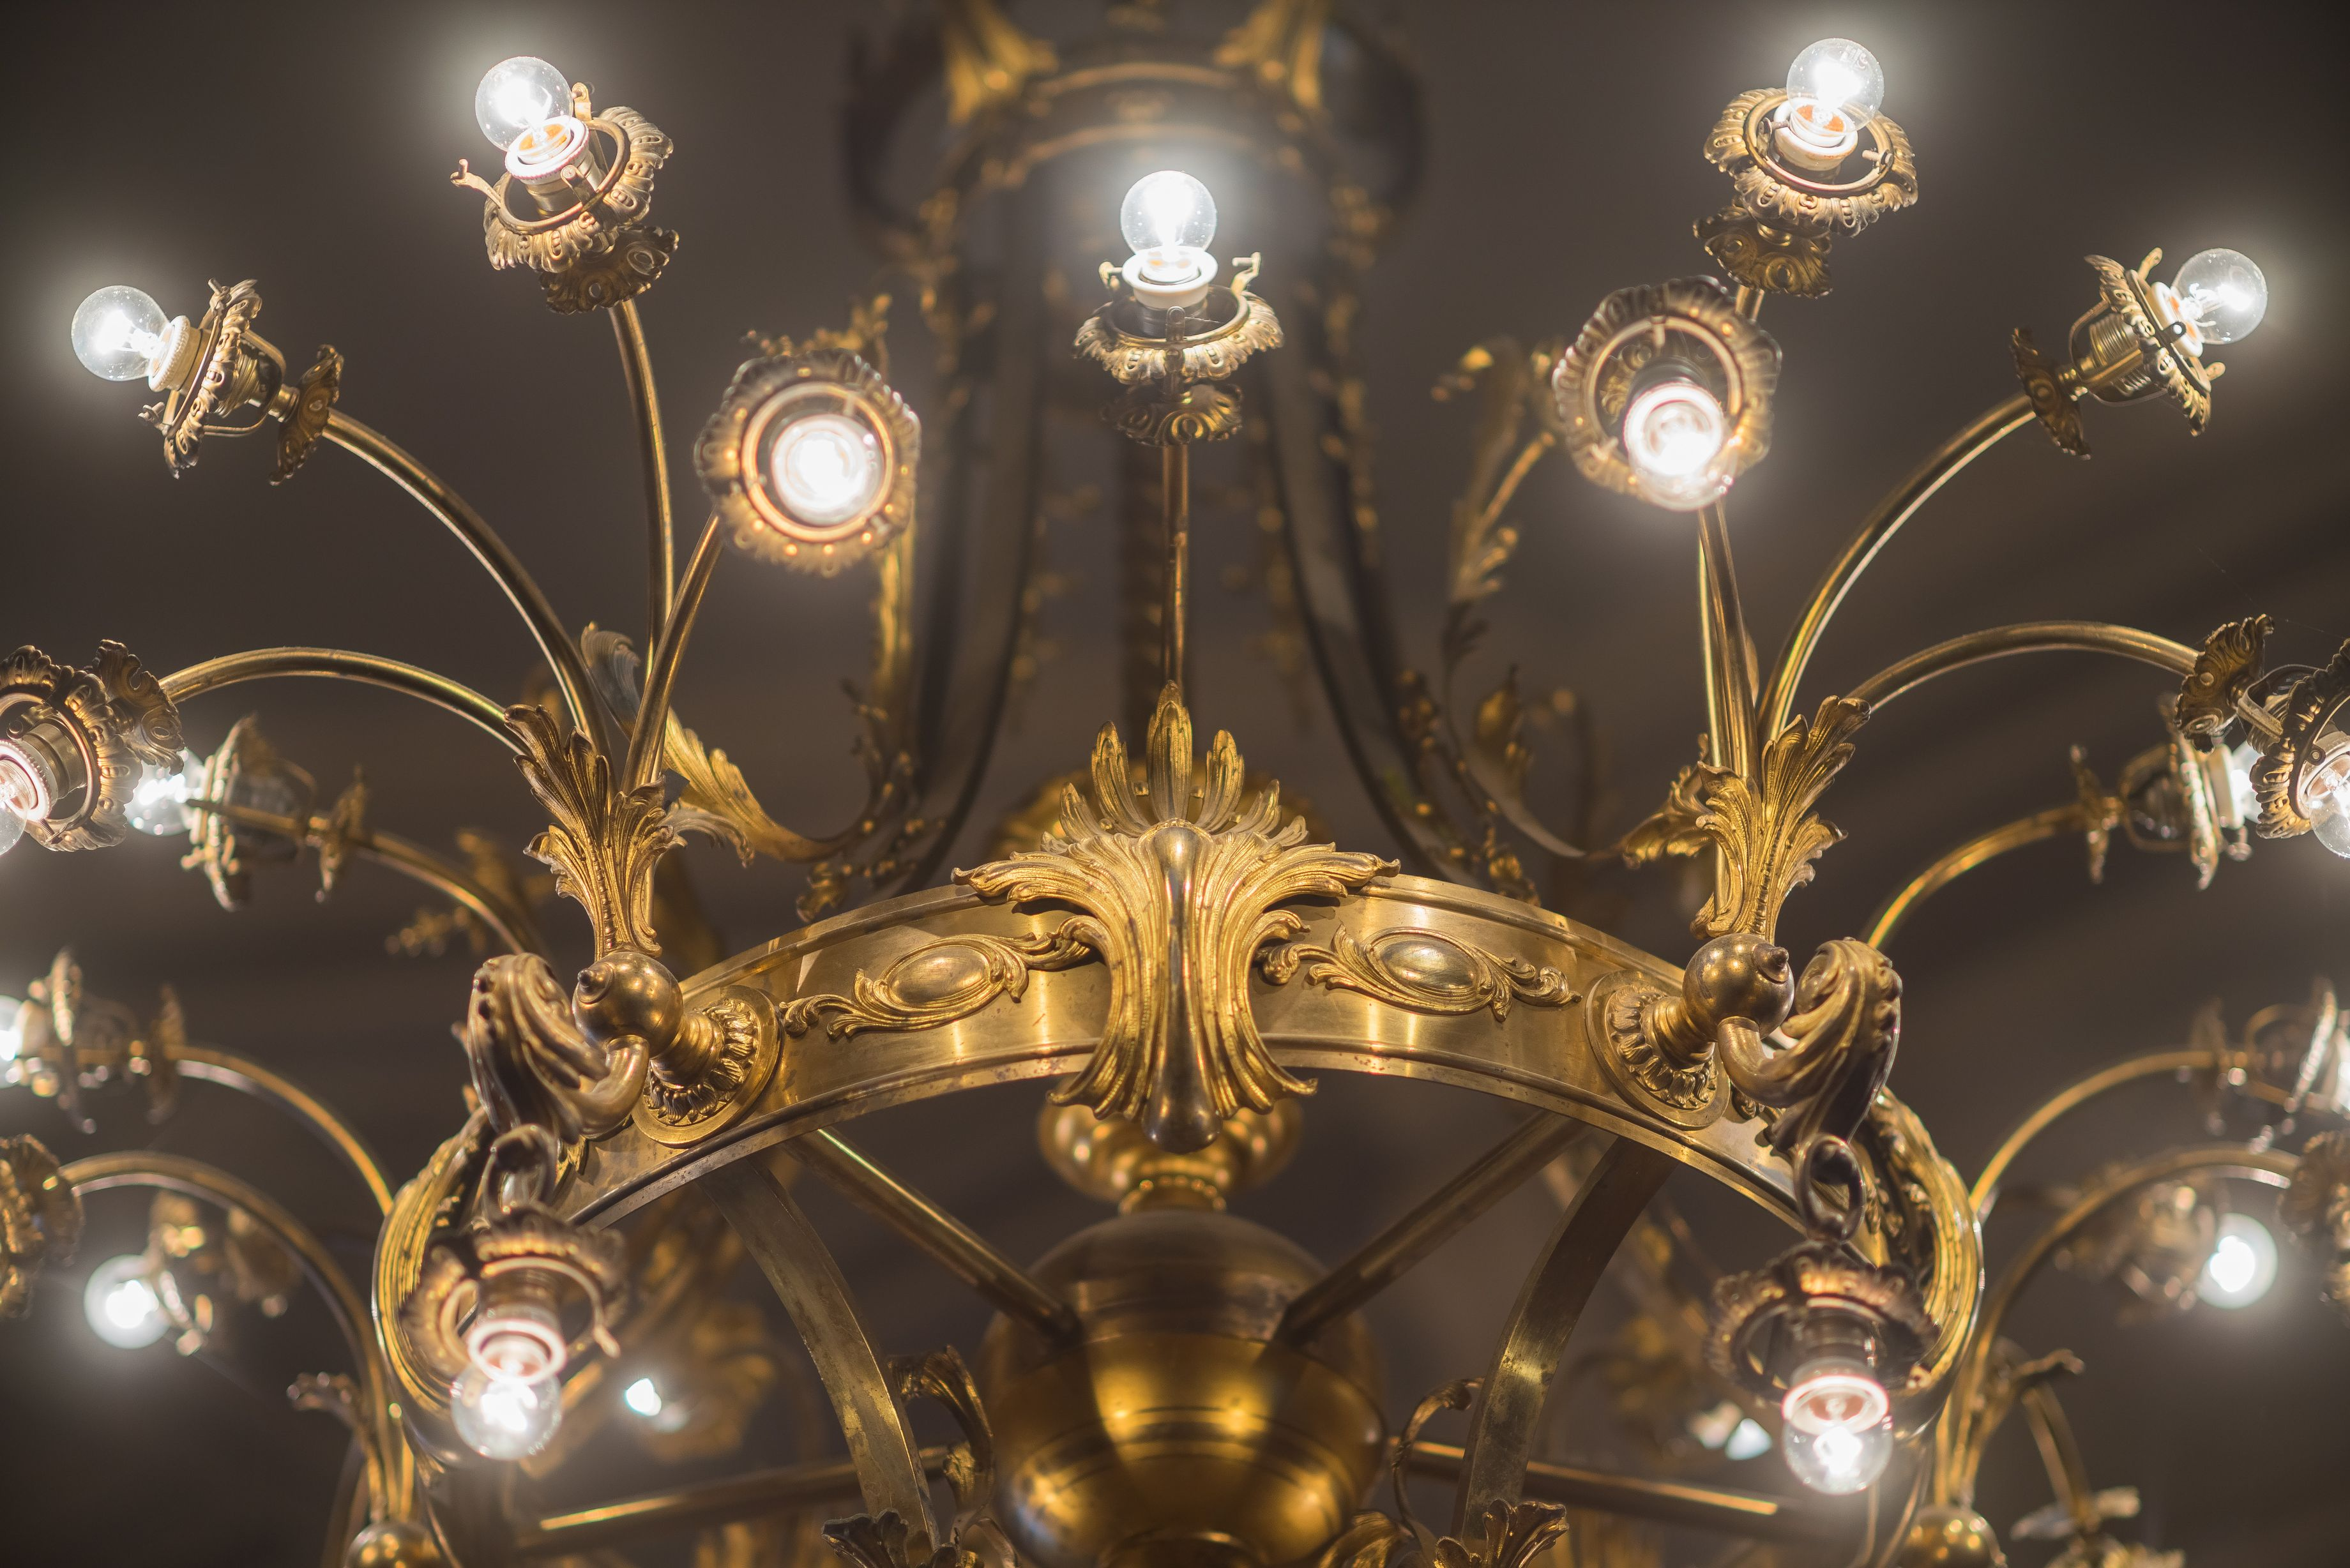 Fragment of chandelier, 1900–1929, Verkiai Palace. Photo by Povilas Jarmala, 2017